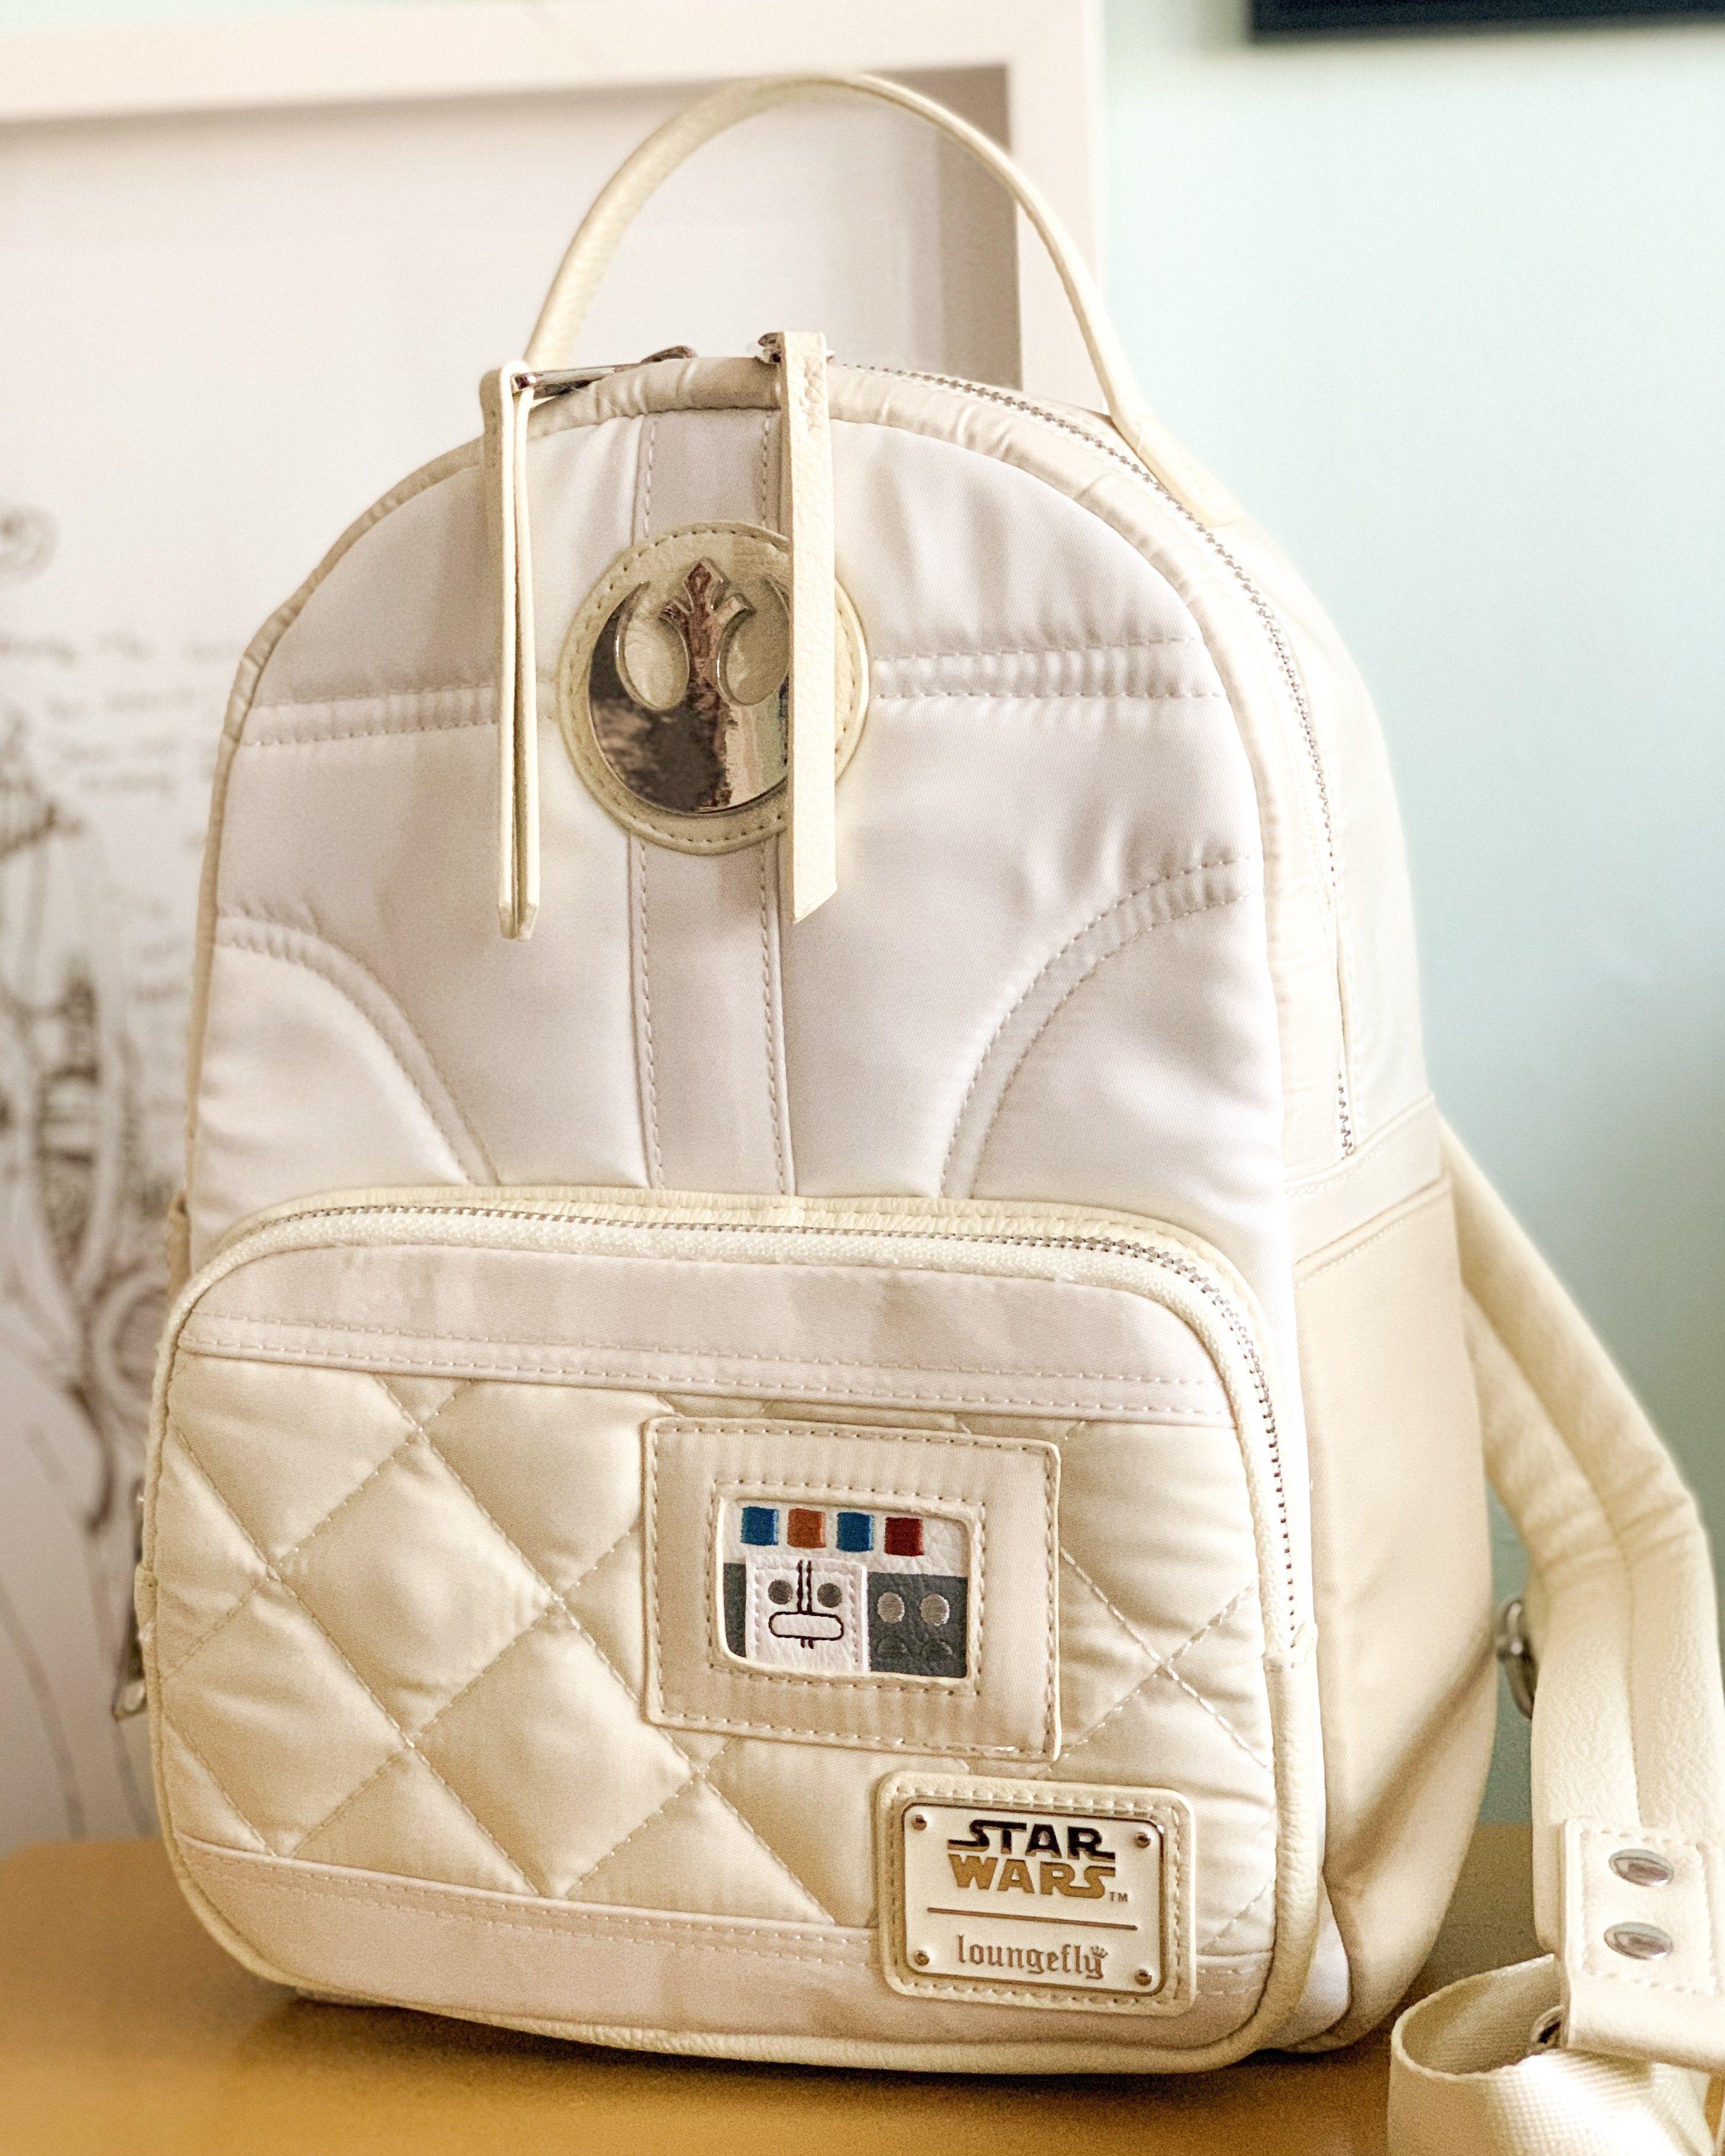 Loungefly Star Wars Princess Leia Mini Backpack